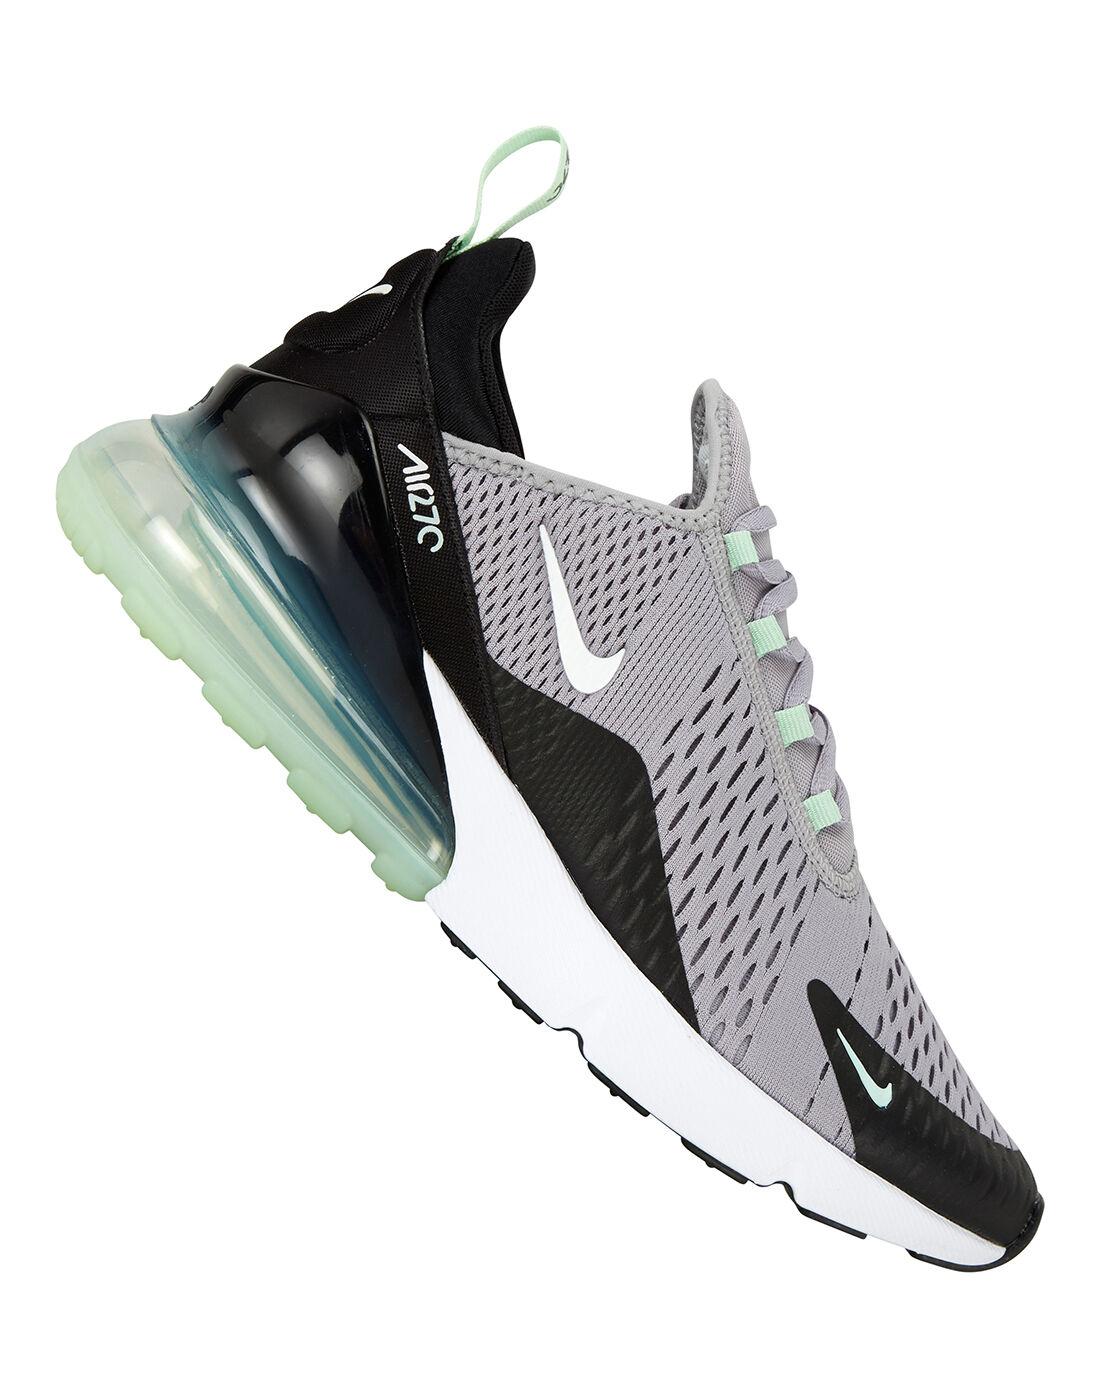 Nike Air Max 270 Premium Leather Men's Running Shoes BQ6171